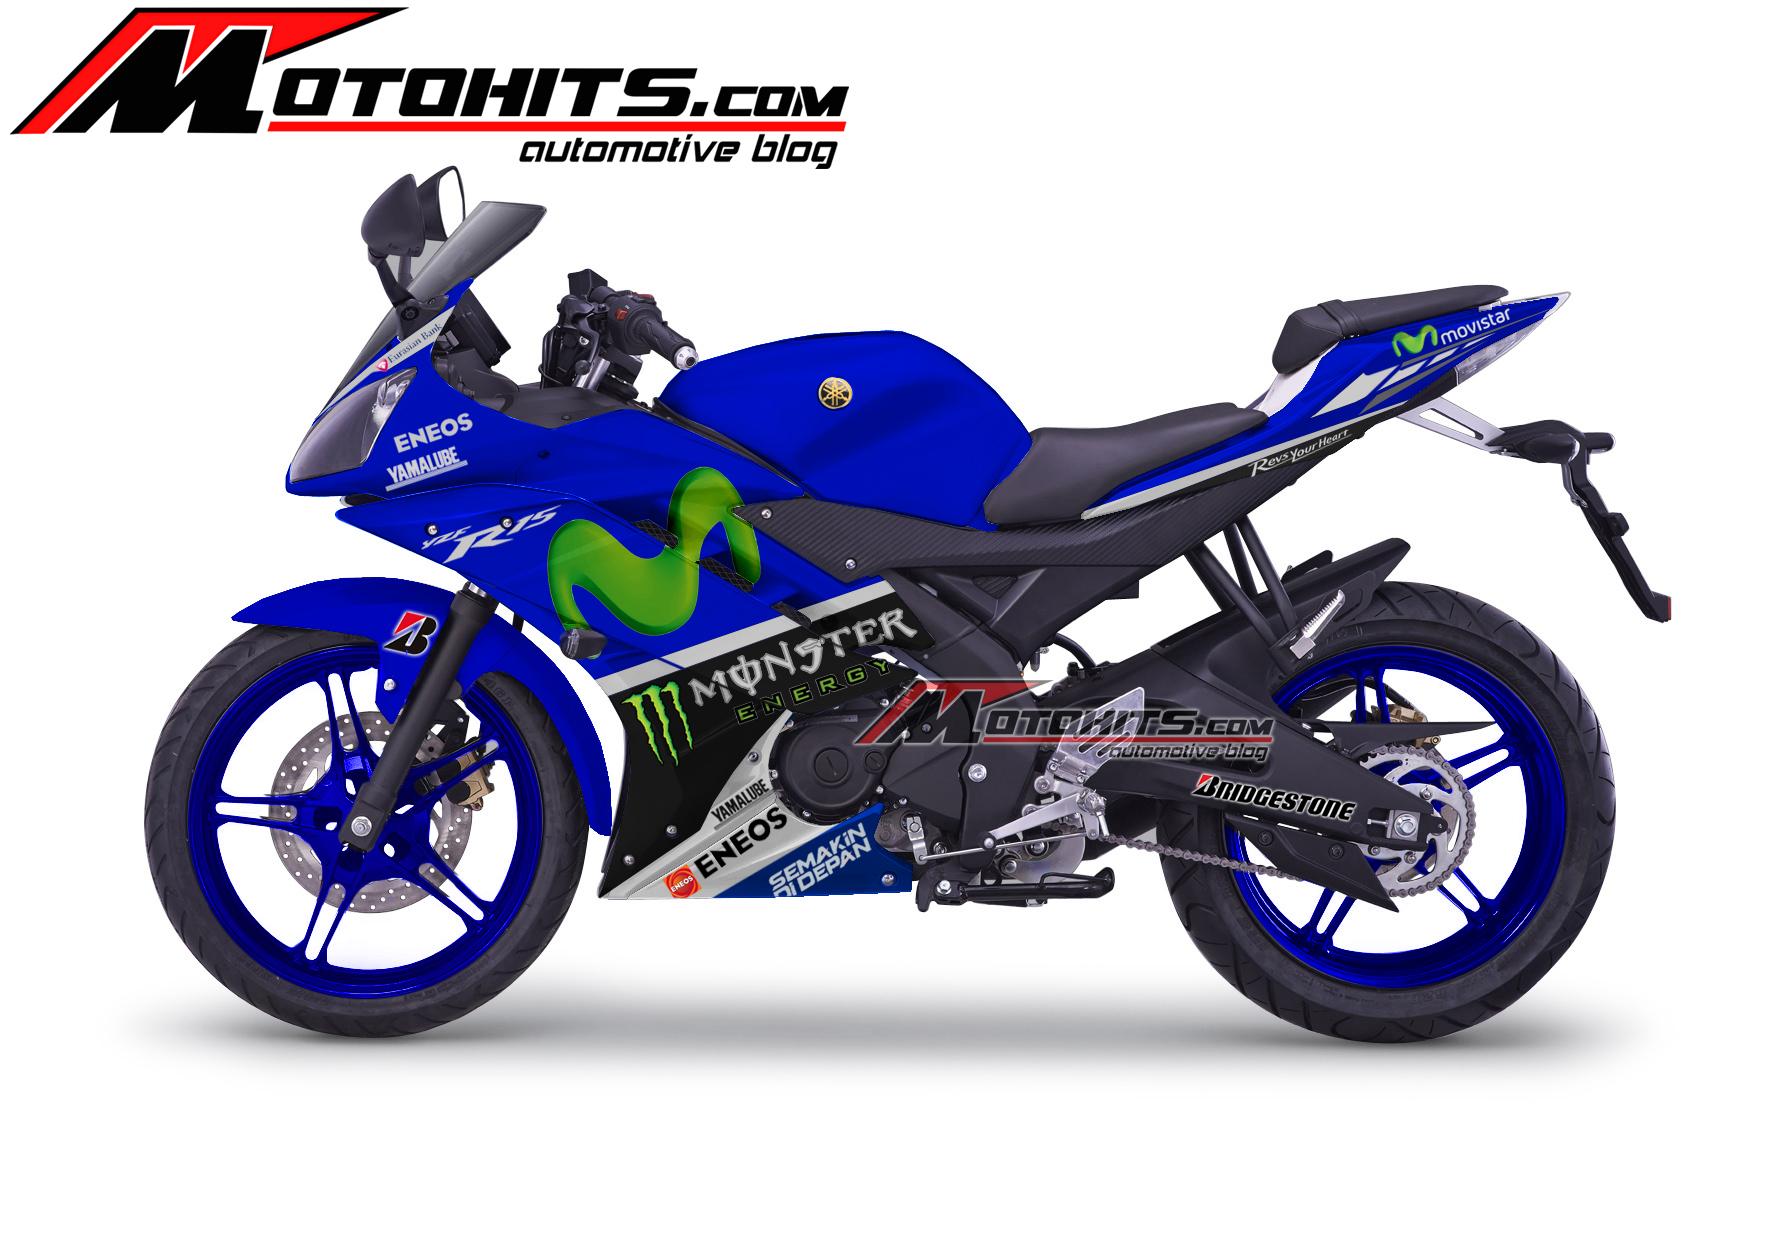 Decal Sticker Yamaha YZF R15 Motohitscom